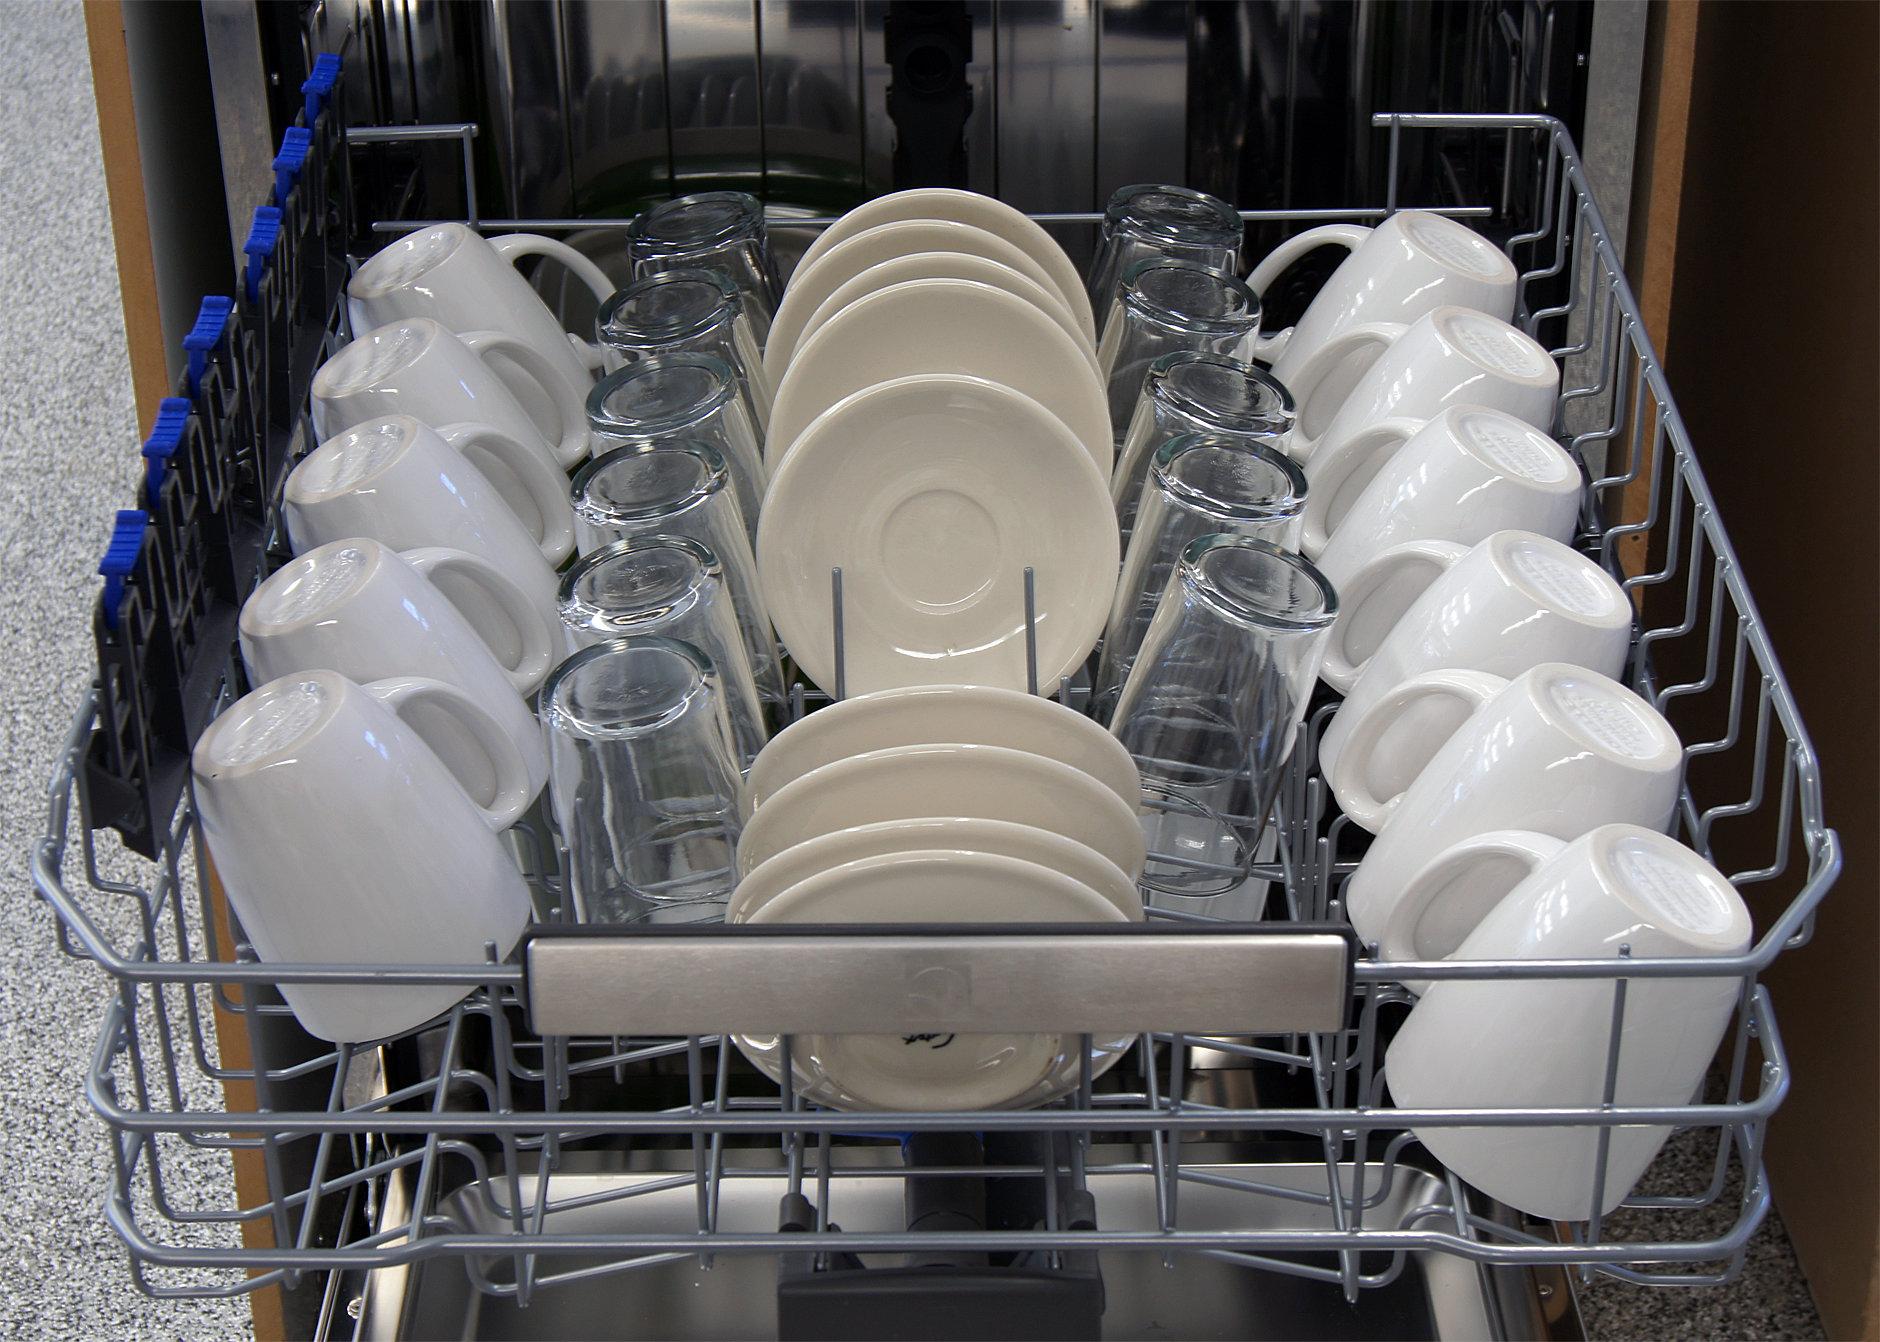 Electrolux EI24ID30QS top capacity